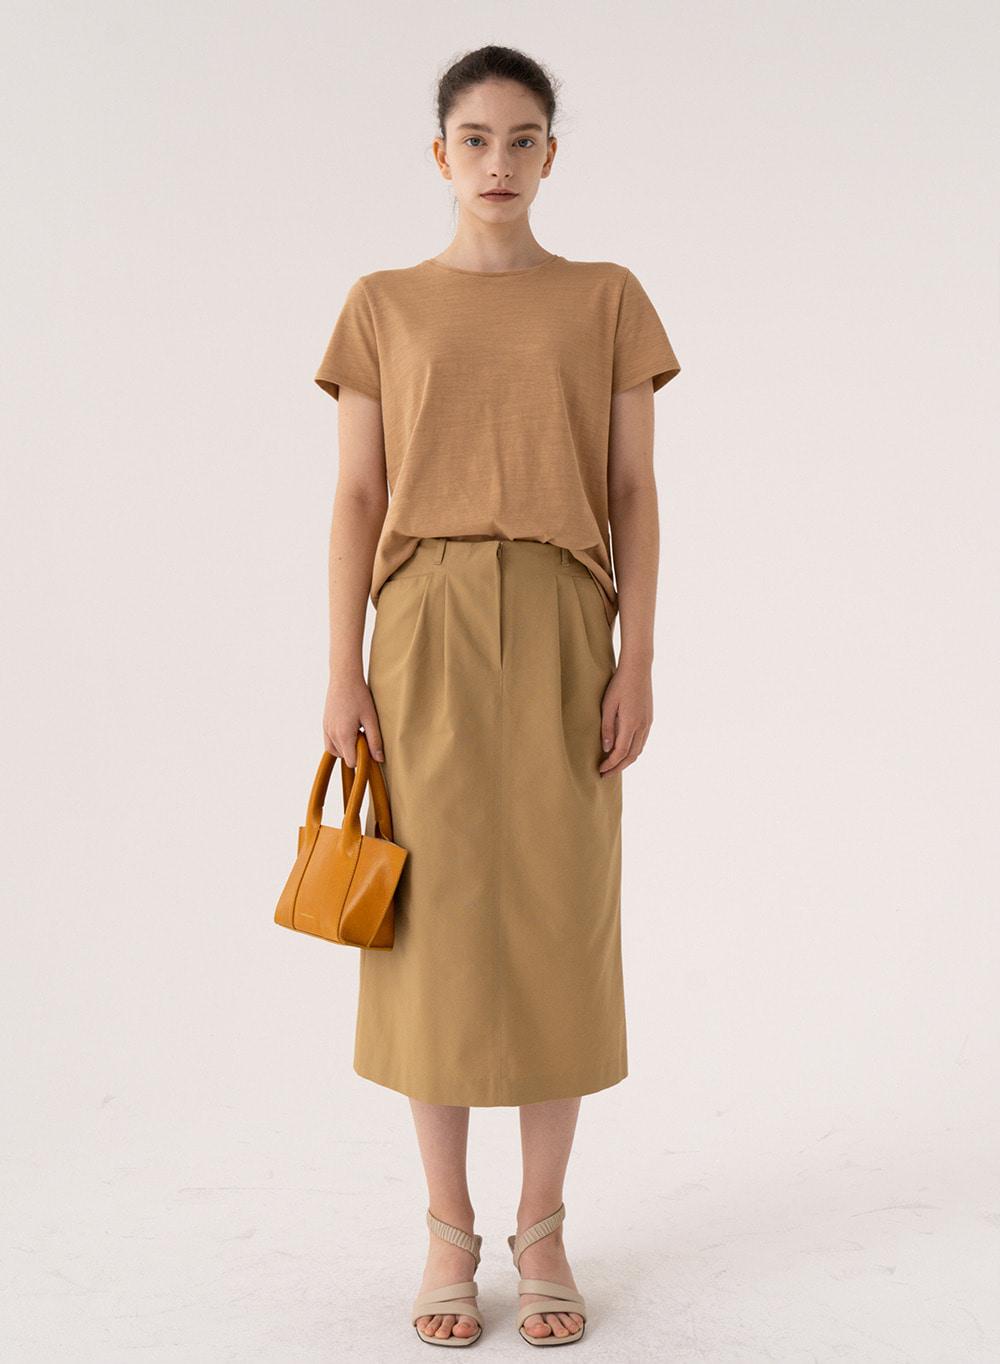 SS21 Straight Midi Skirt From Japan (COSMO) Cinnamon